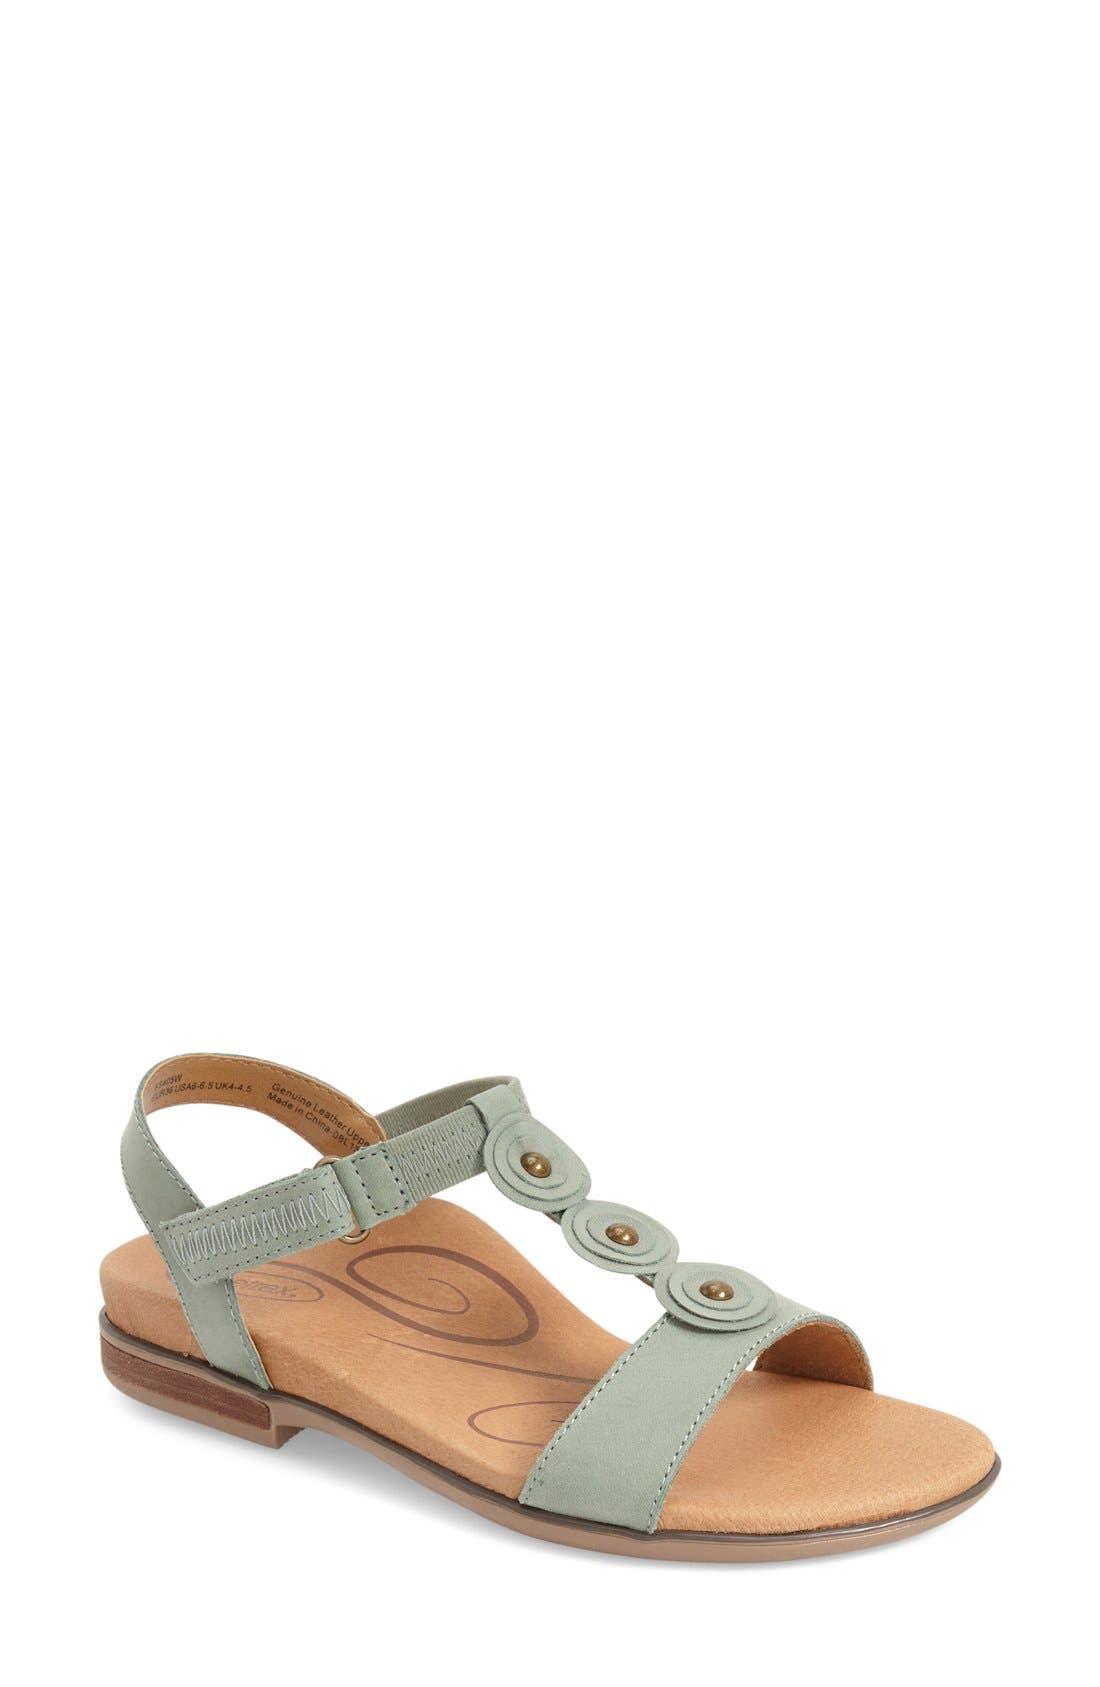 'Sharon' T-Strap Sandal,                         Main,                         color, Mint Leather